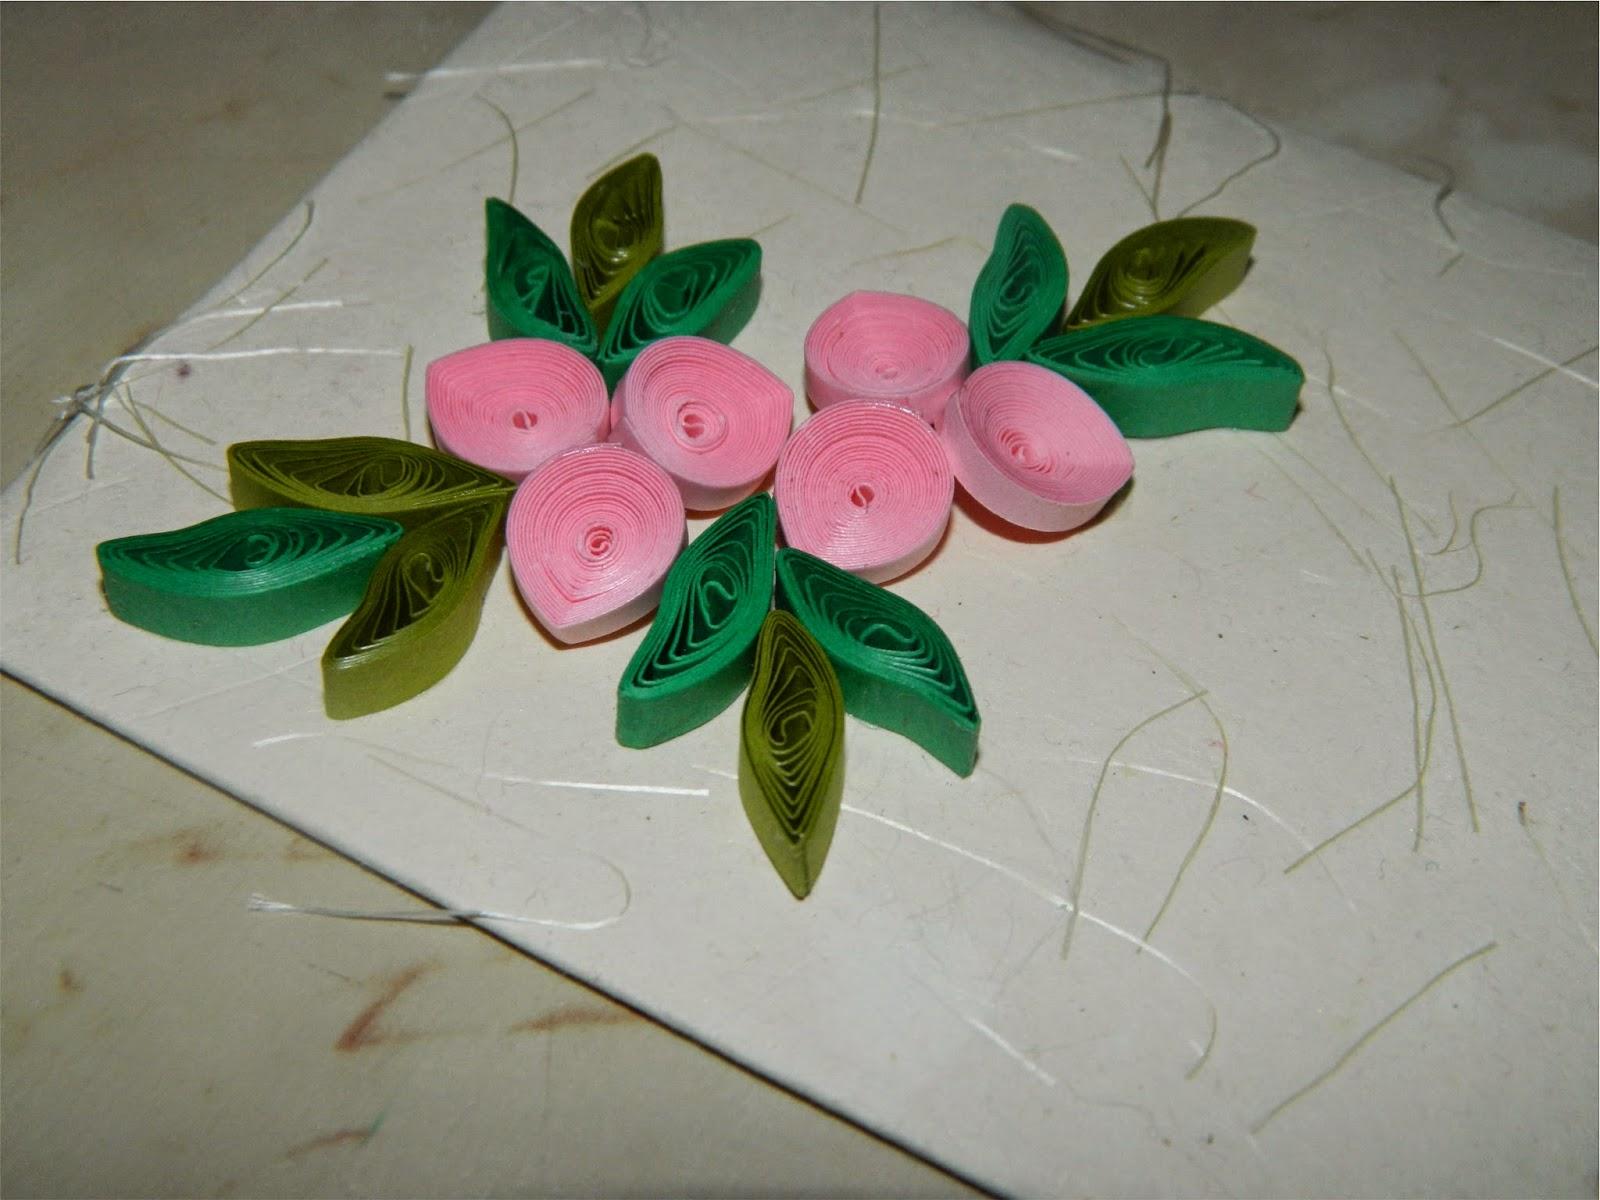 Paper Quilling Designs For Envelope Creative Art Craft Work